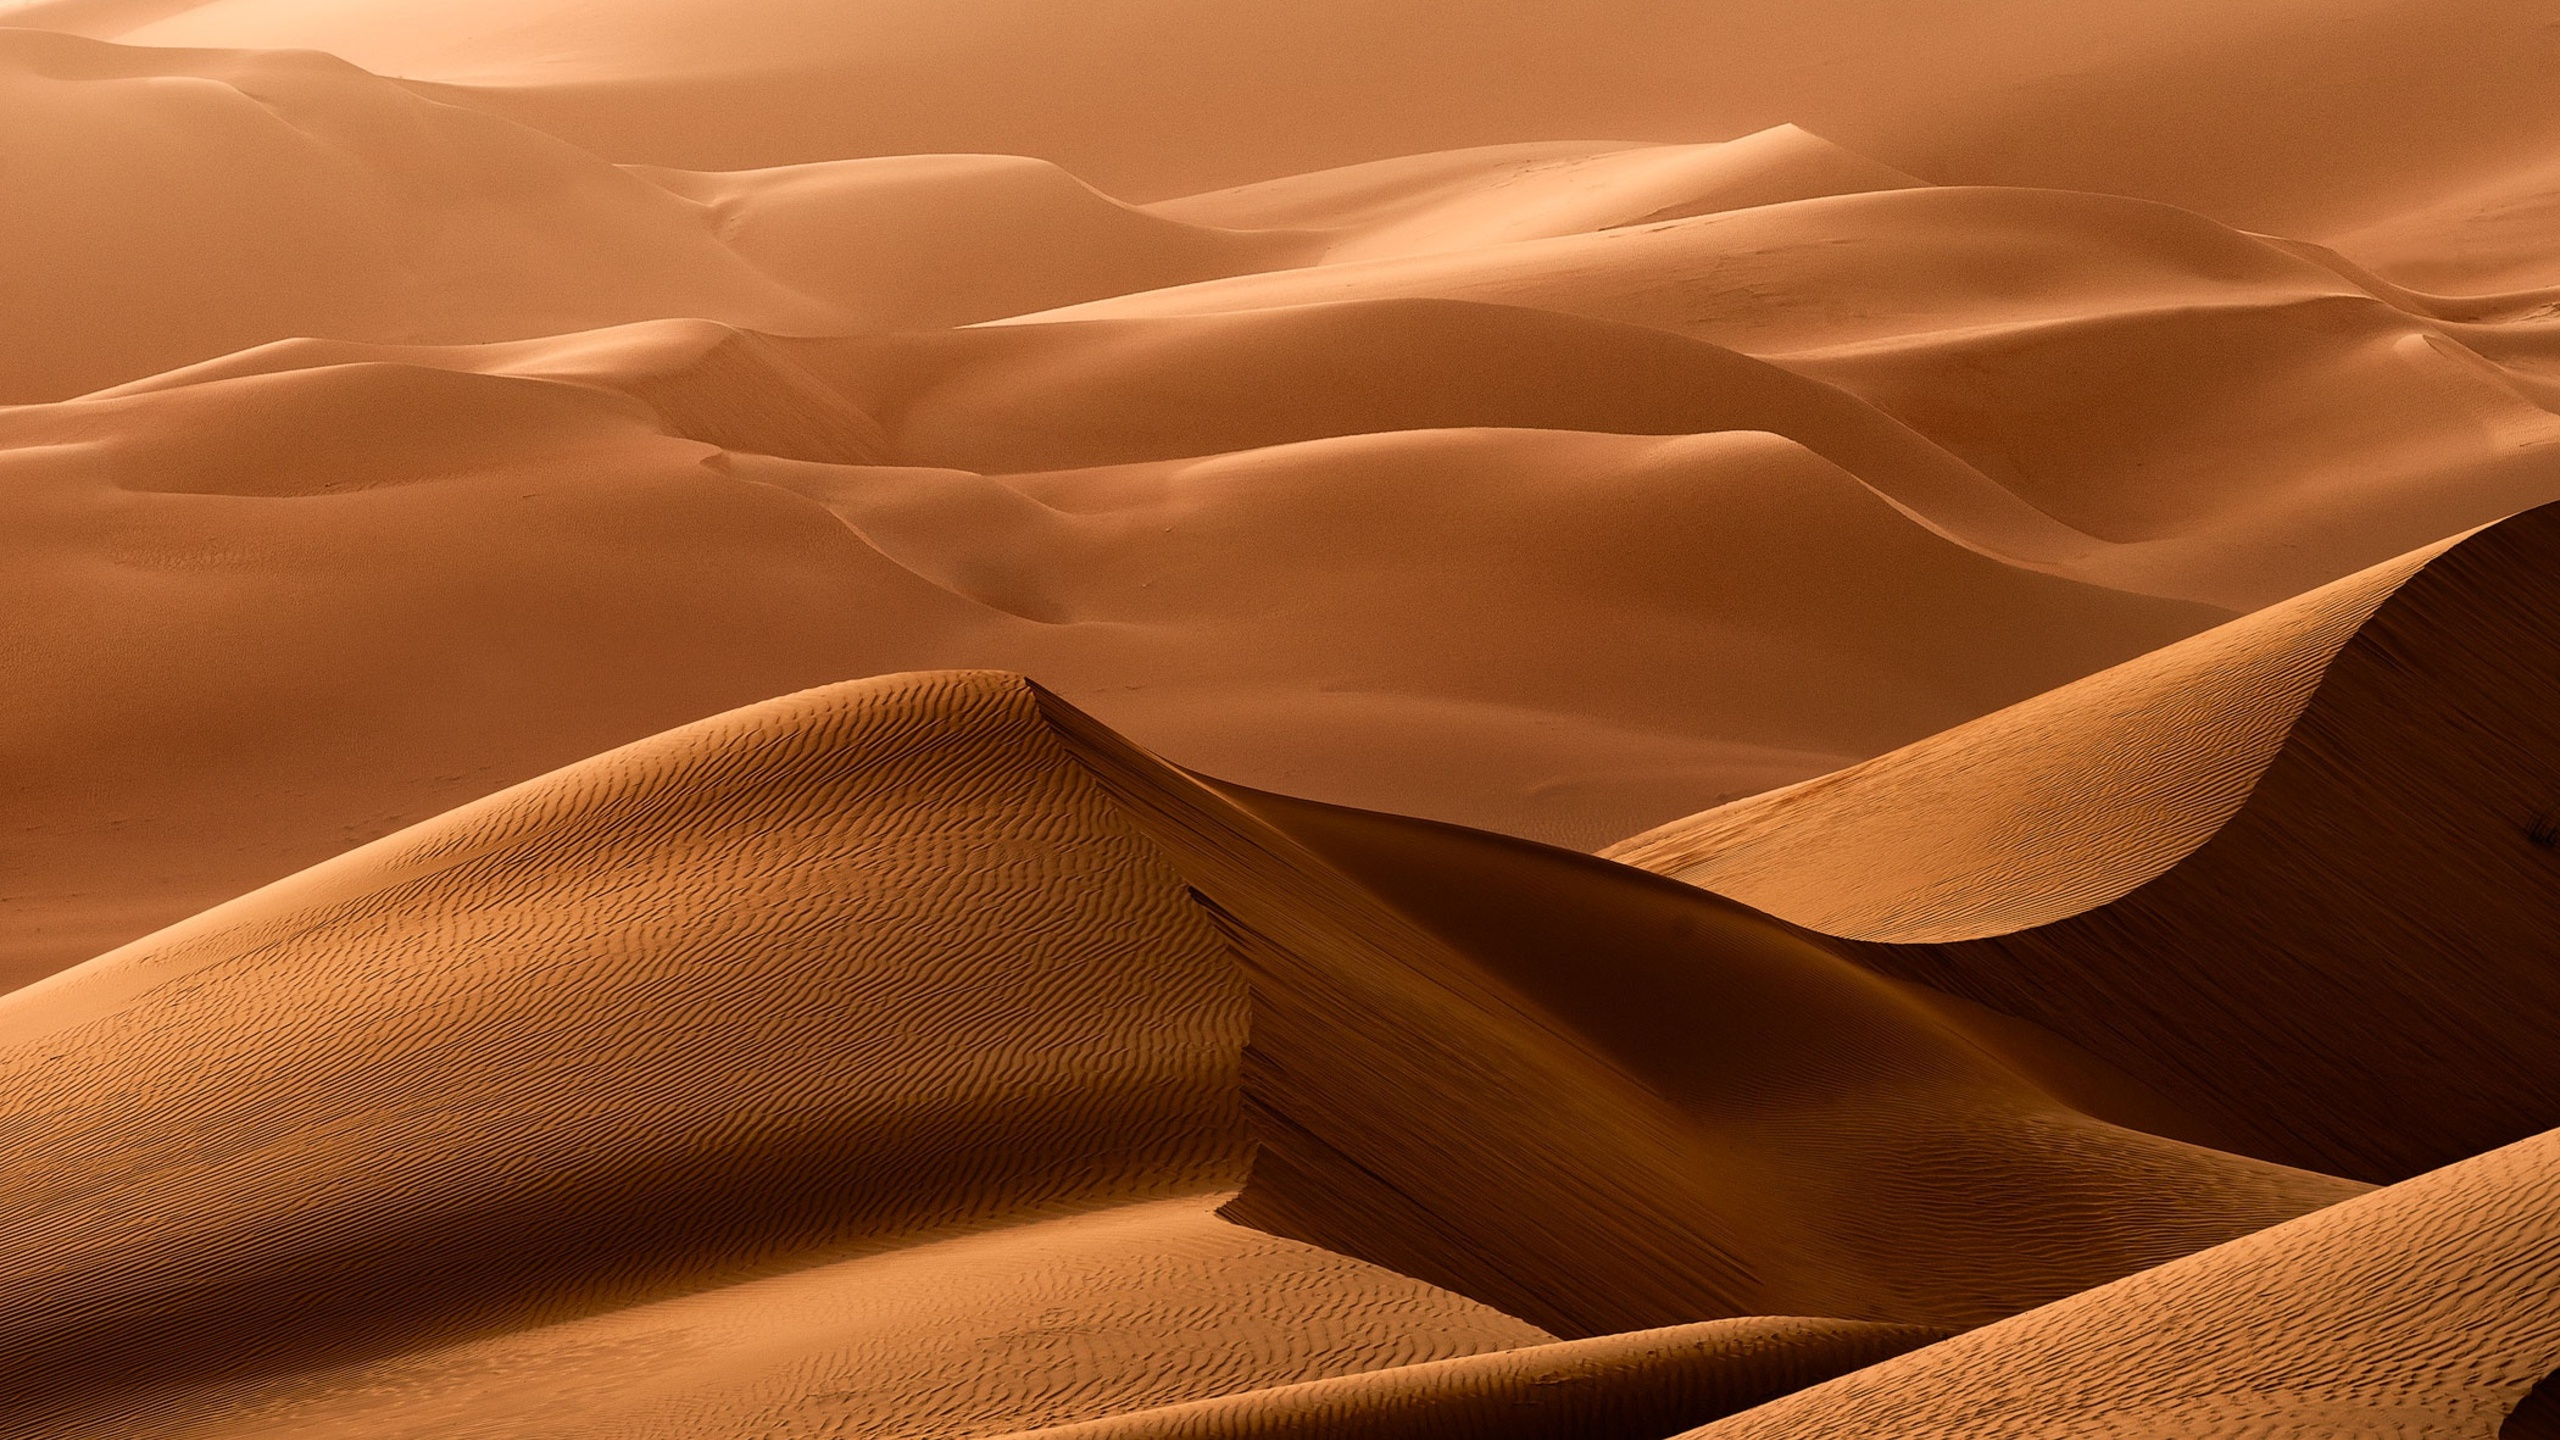 барханы пустыня дюны  № 1291871 бесплатно